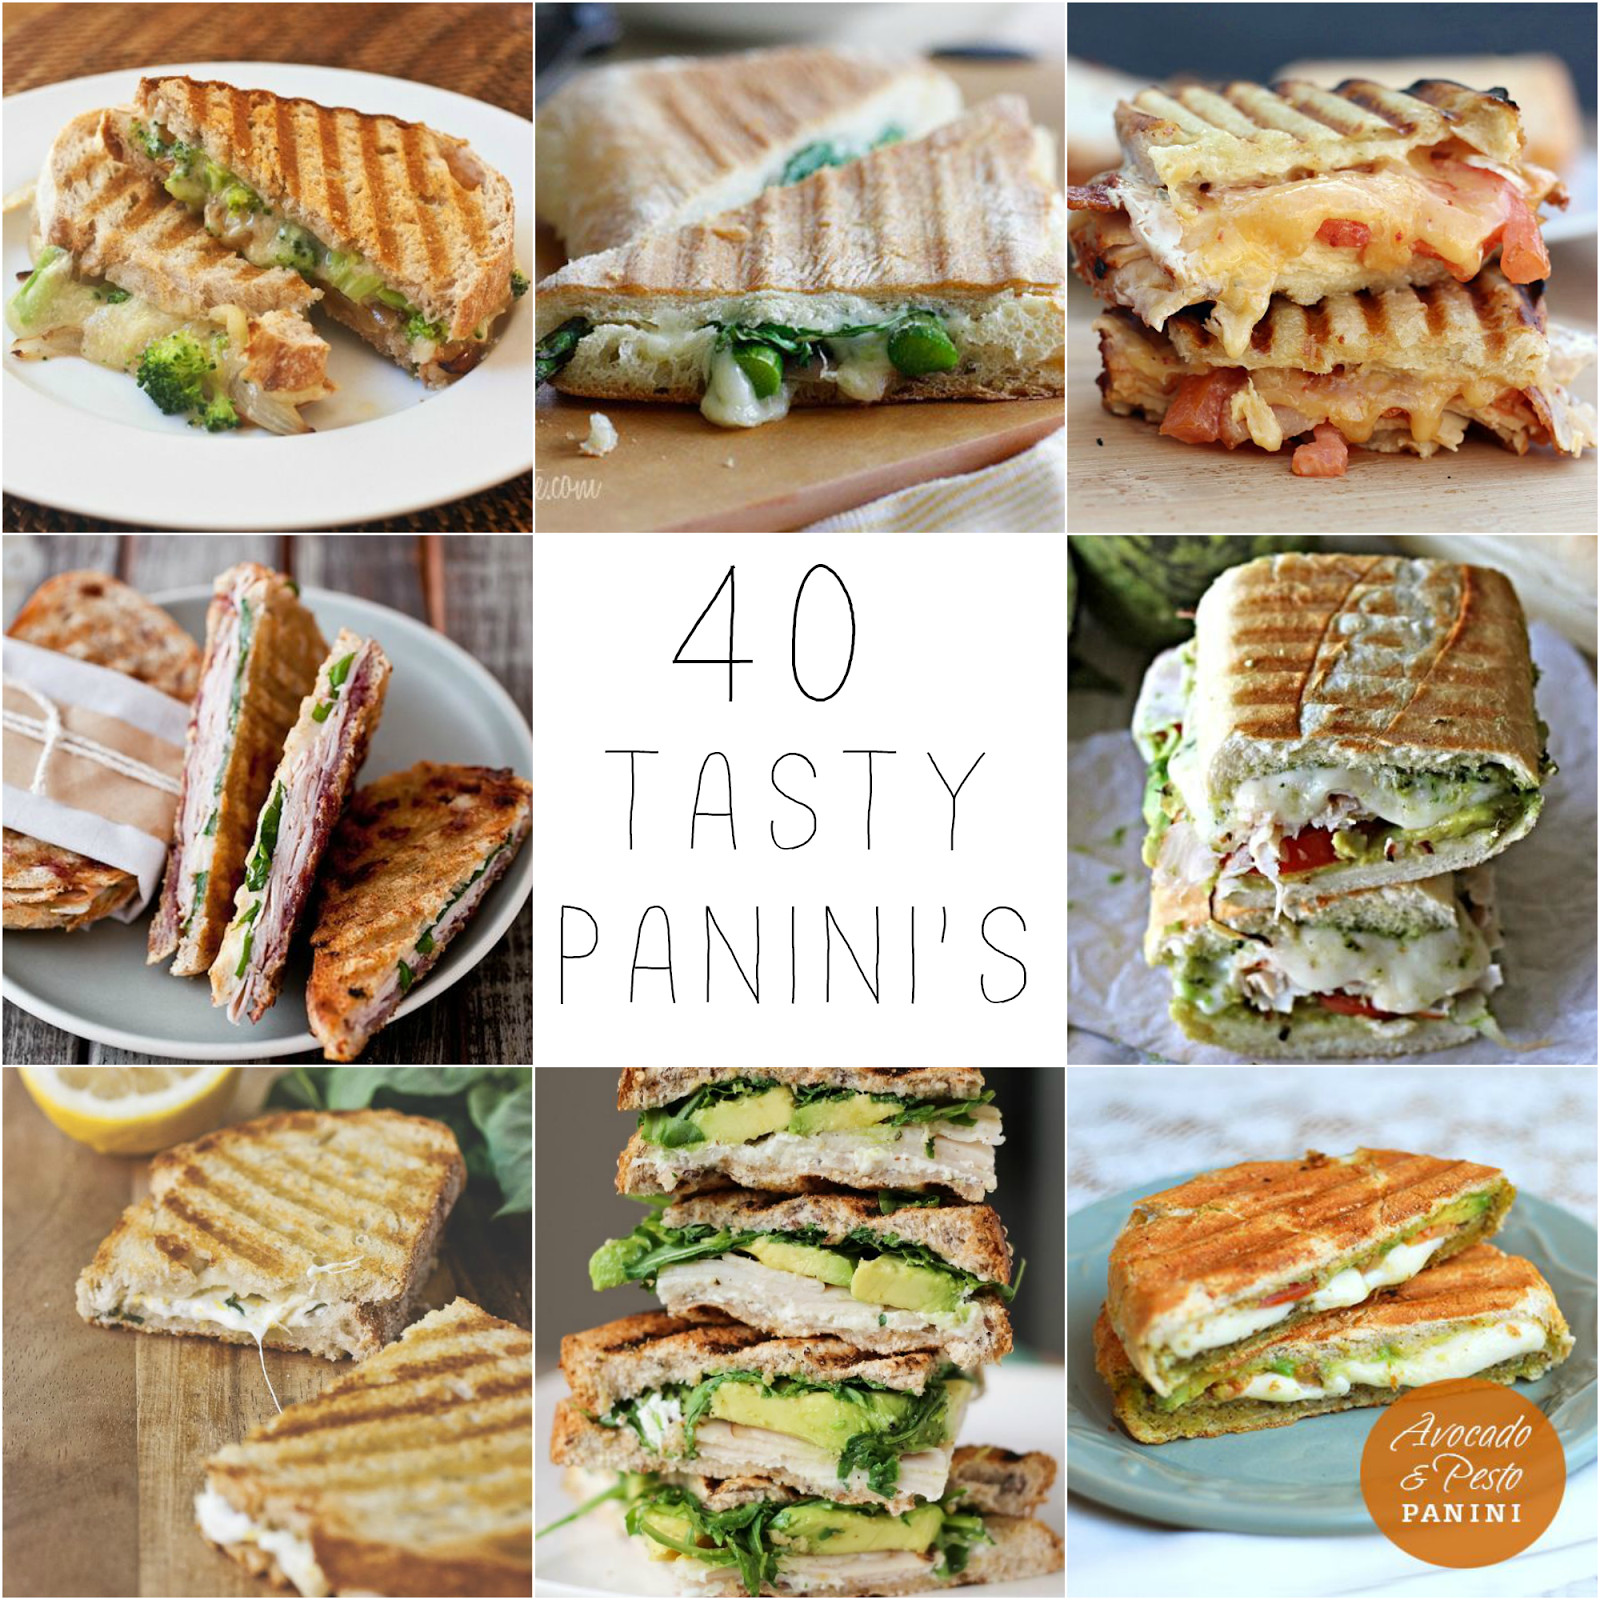 Panini Press Recipes  40 Panini Recipes